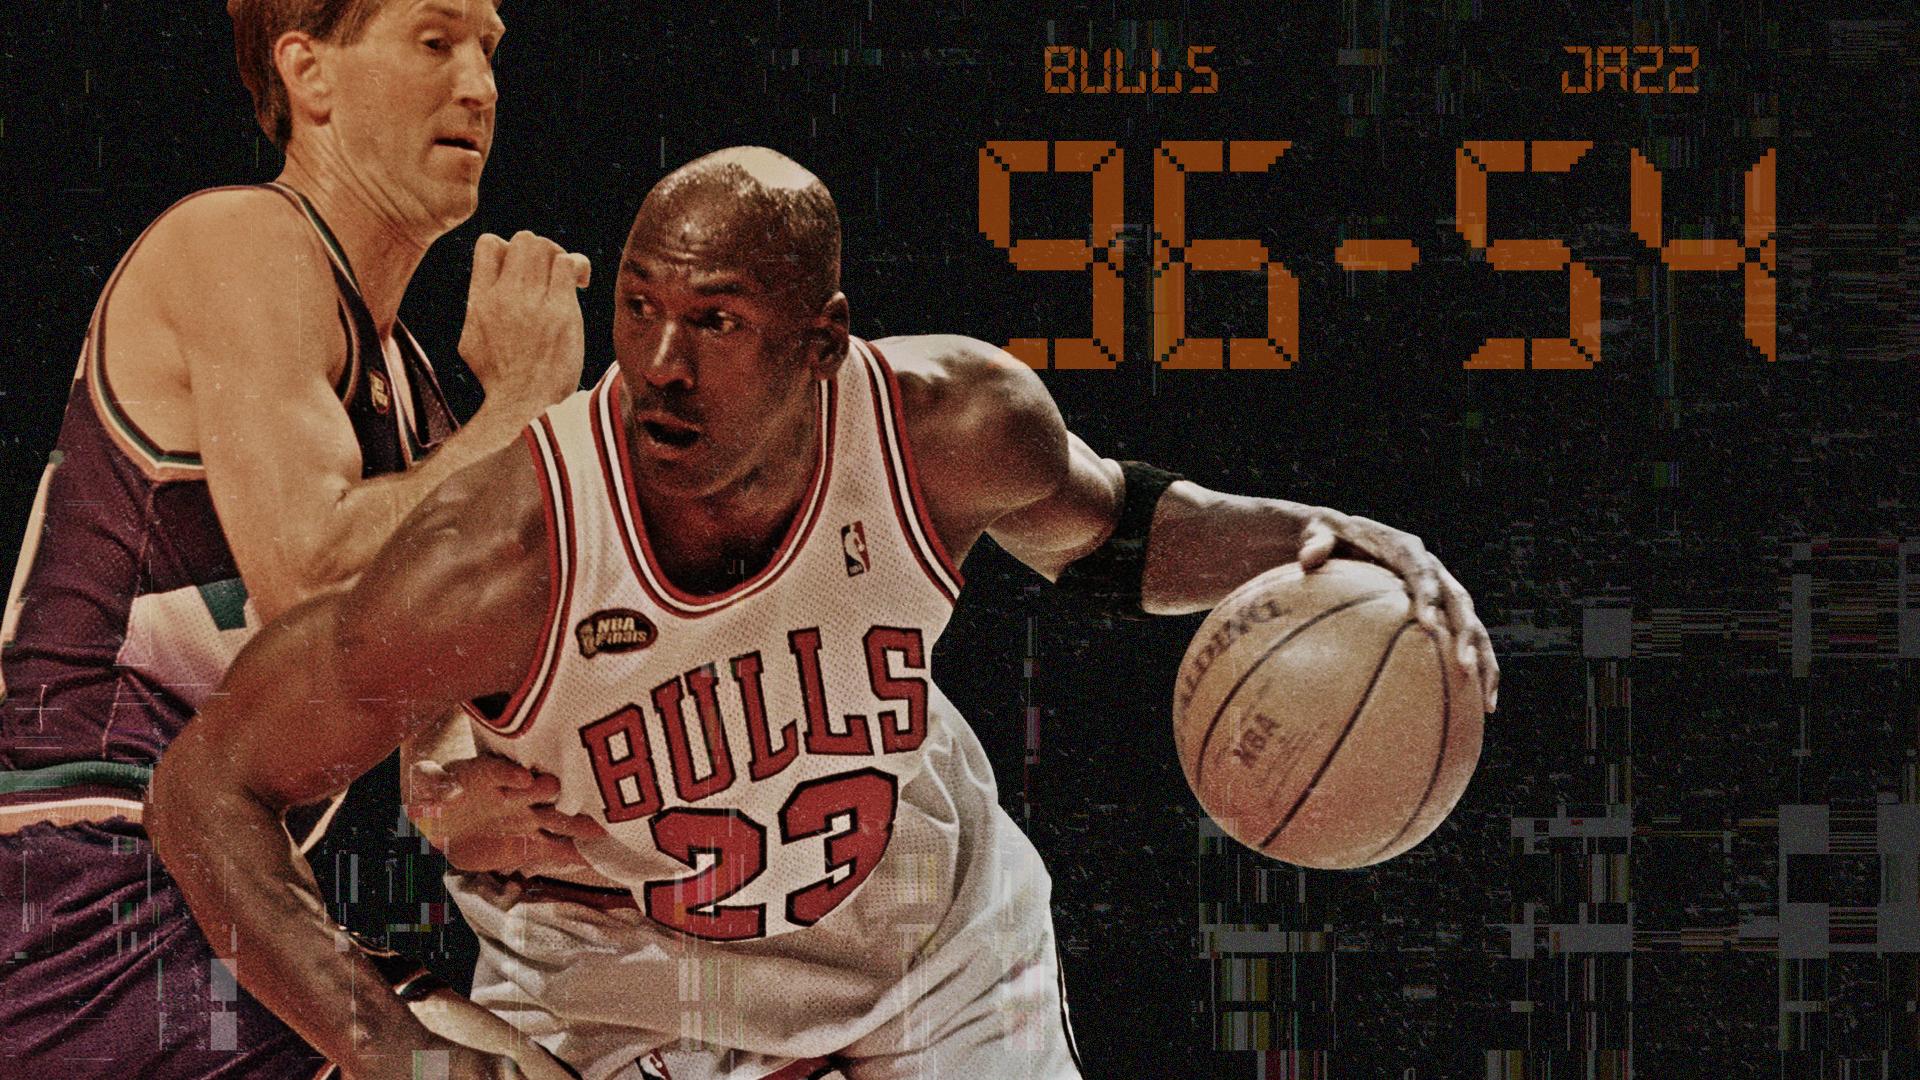 Remembering When Michael Jordan Bulls Shut Down Jazz In Biggest Nba Finals Blowout Ever Sporting News